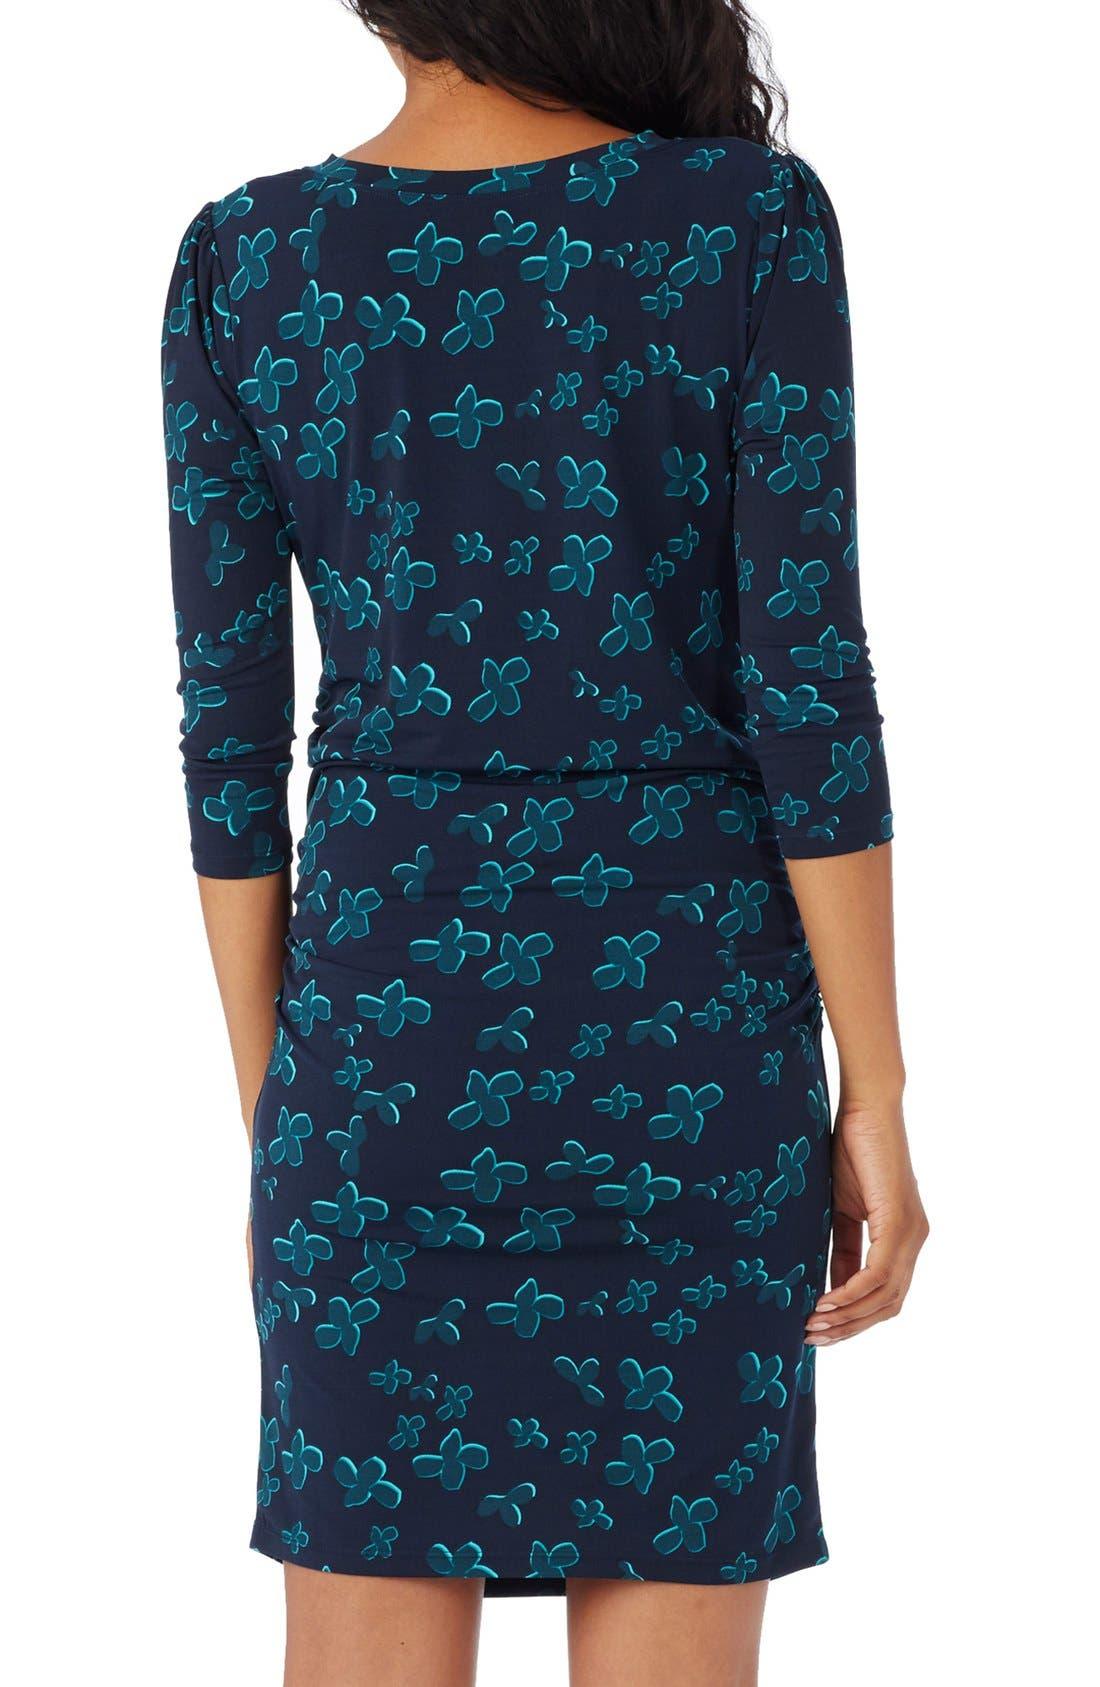 'Stephanie' Knit Maternity Dress,                             Alternate thumbnail 2, color,                             Indigo Multi